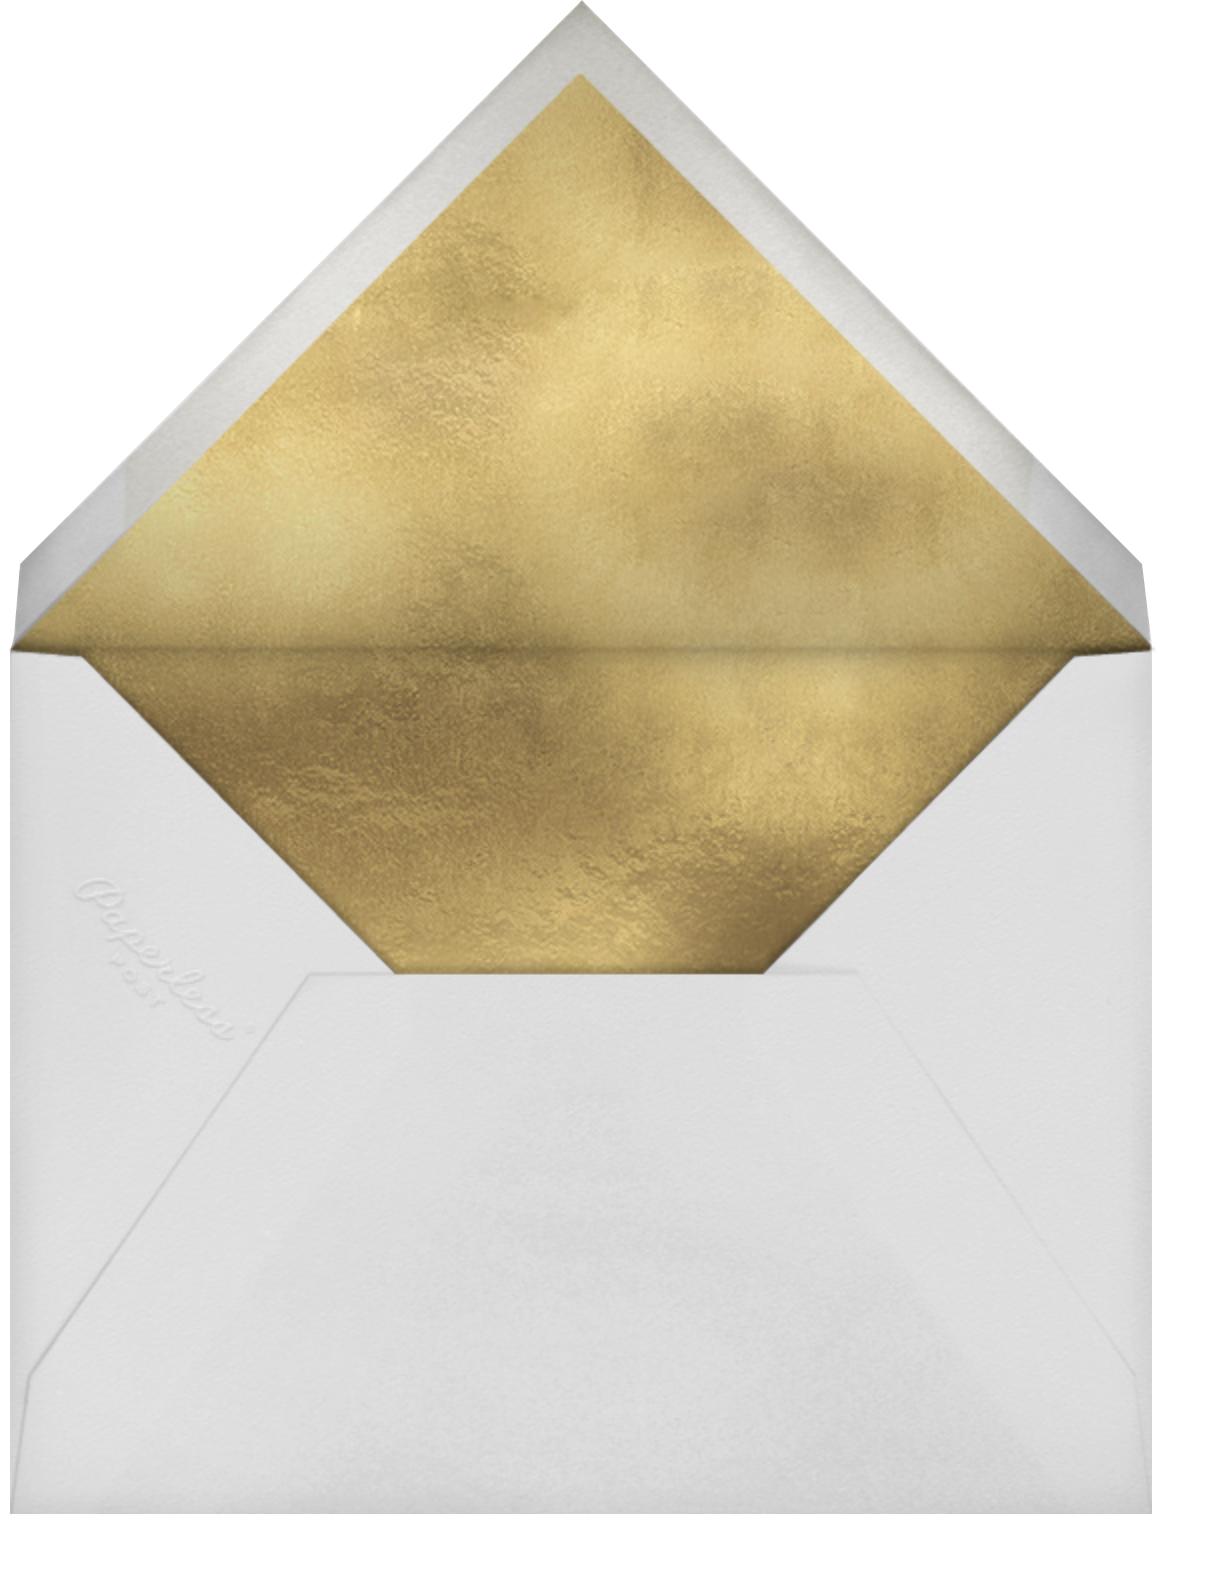 Kissapöllö - White - Marimekko - New Year's Eve - envelope back